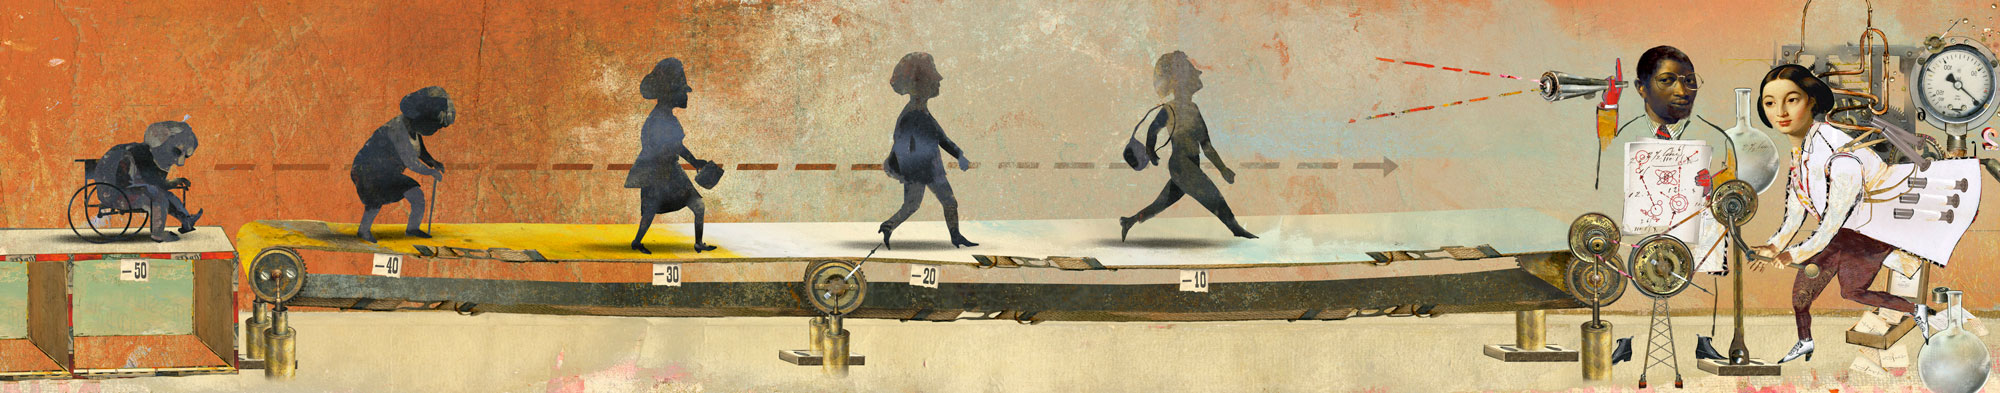 Illustration of people on a long treadmill